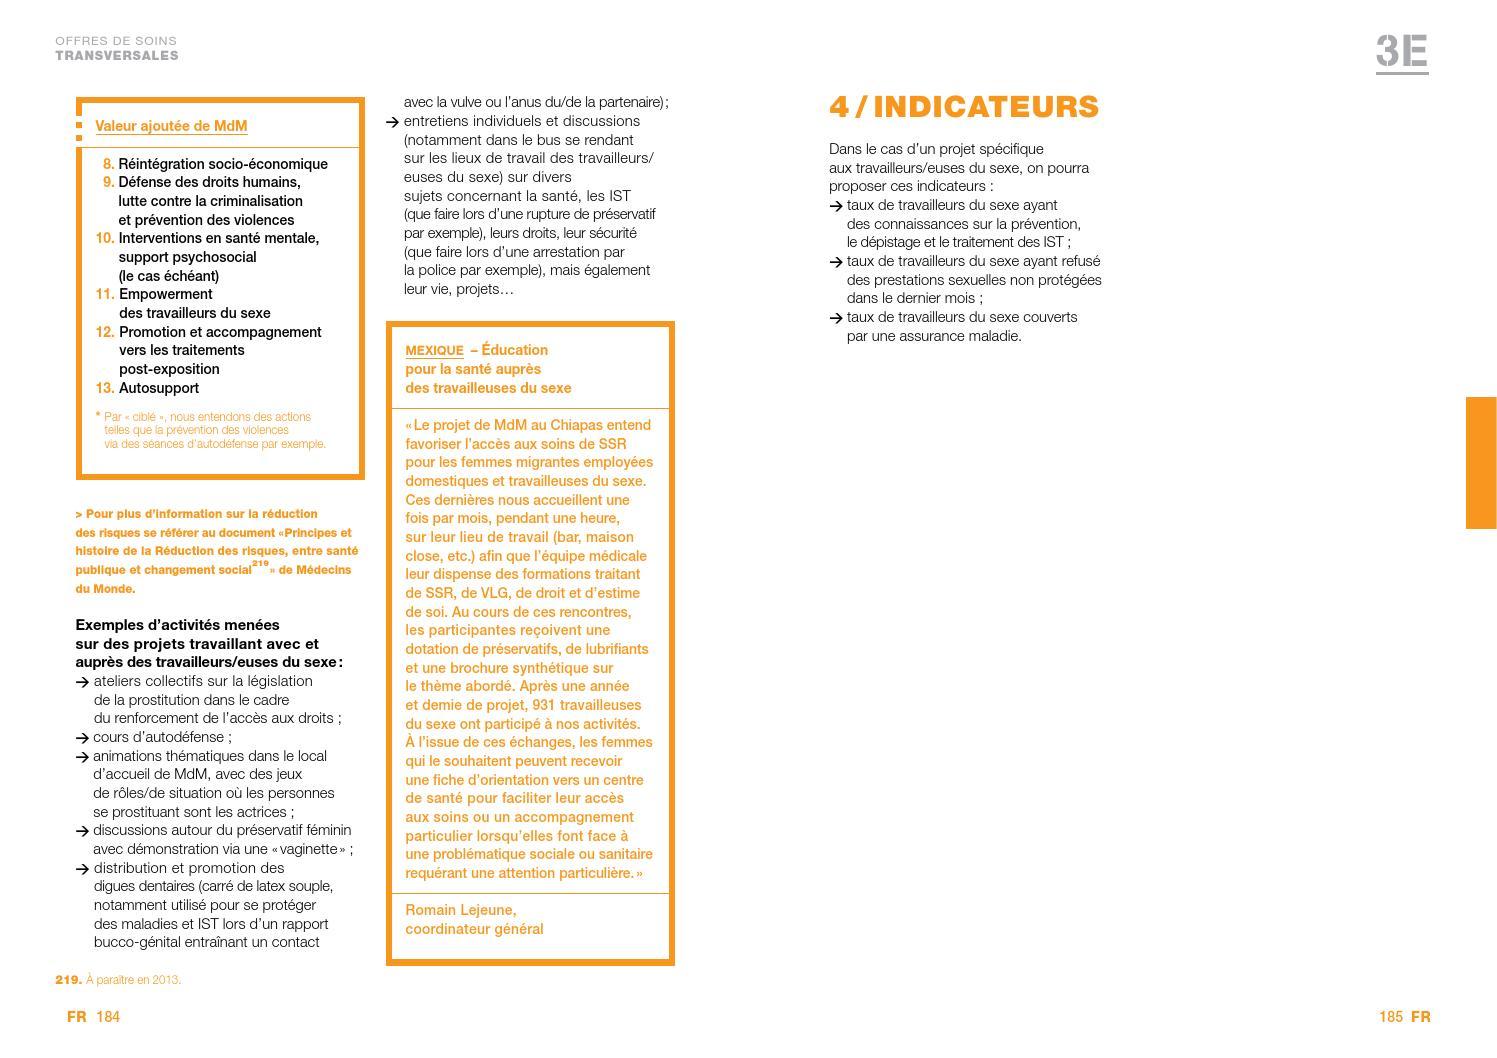 Guide Sante Sexuelle Et Reproductive Medecins Du Monde By Medecins